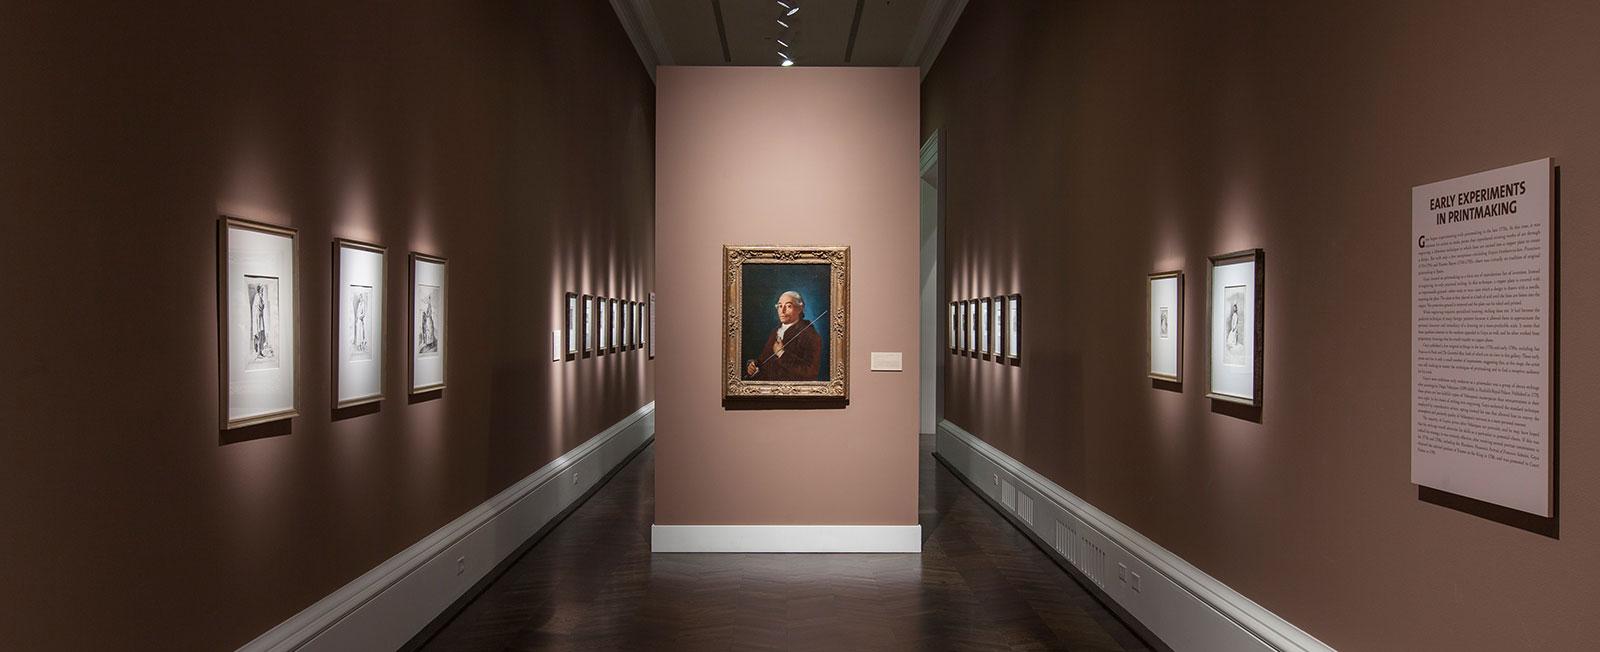 Curating Goya international Symposium installation photo